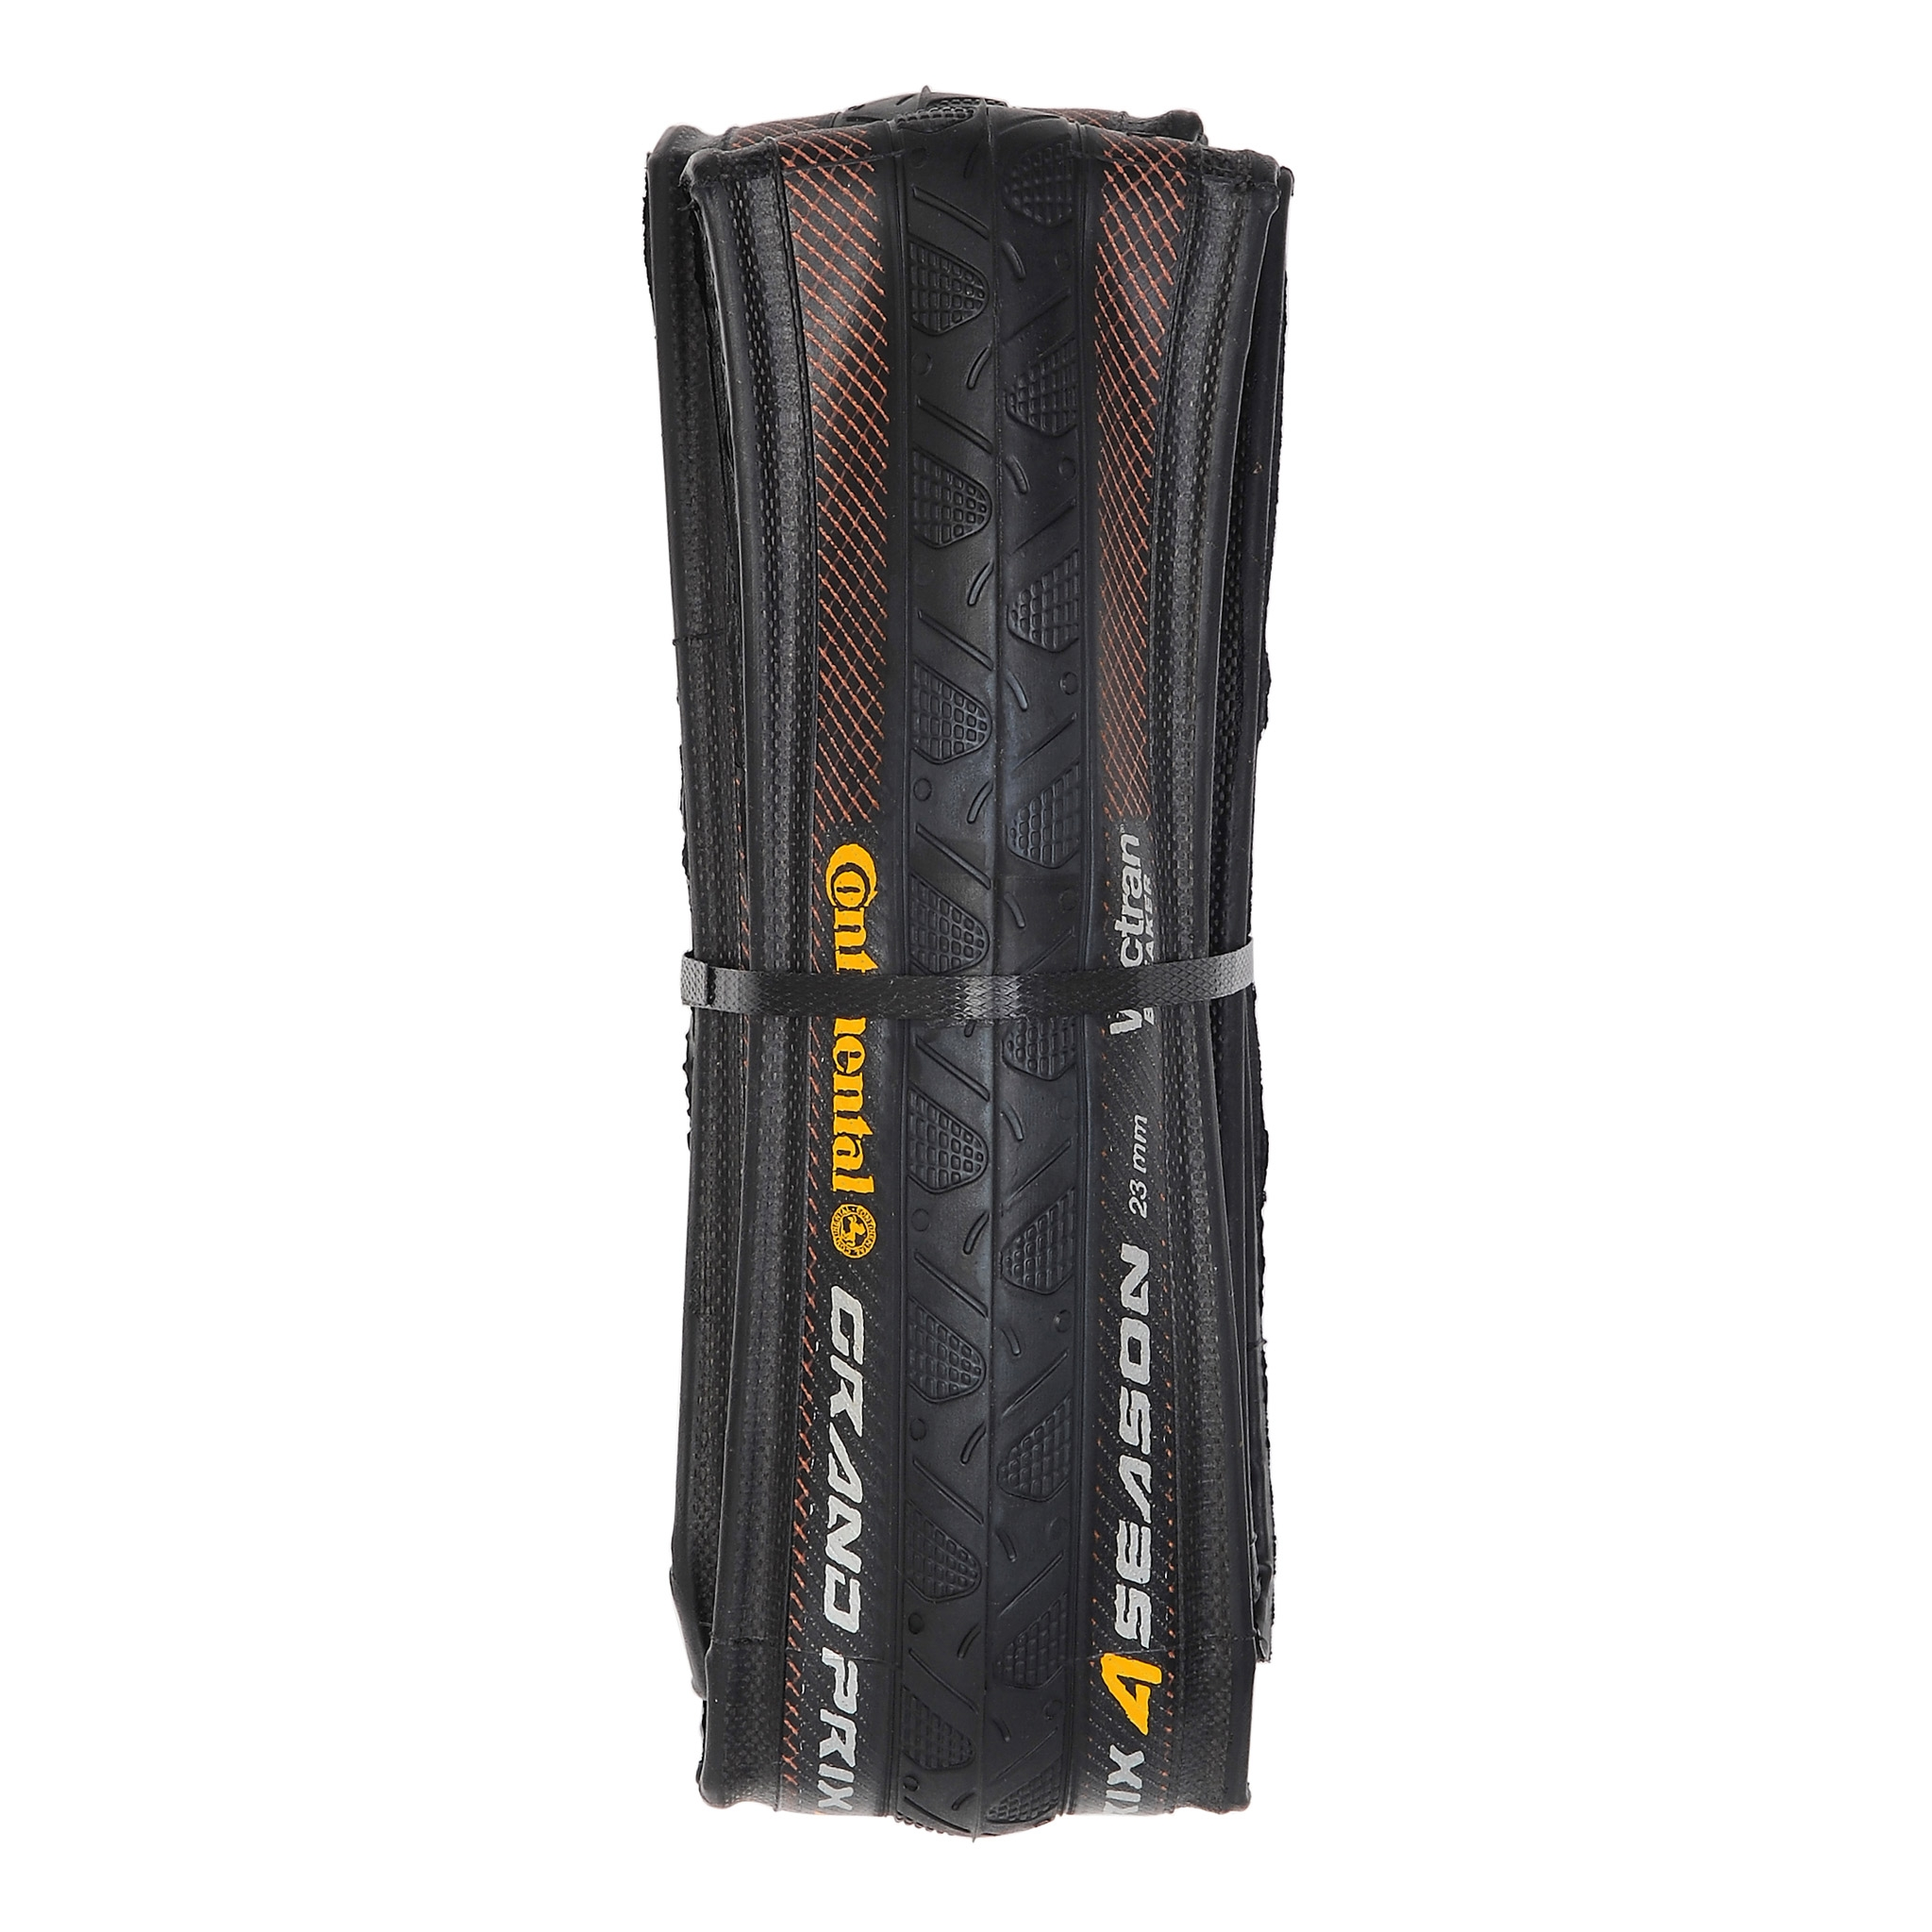 pneu continental grand prix 4 season 700x23c souple probikeshop. Black Bedroom Furniture Sets. Home Design Ideas